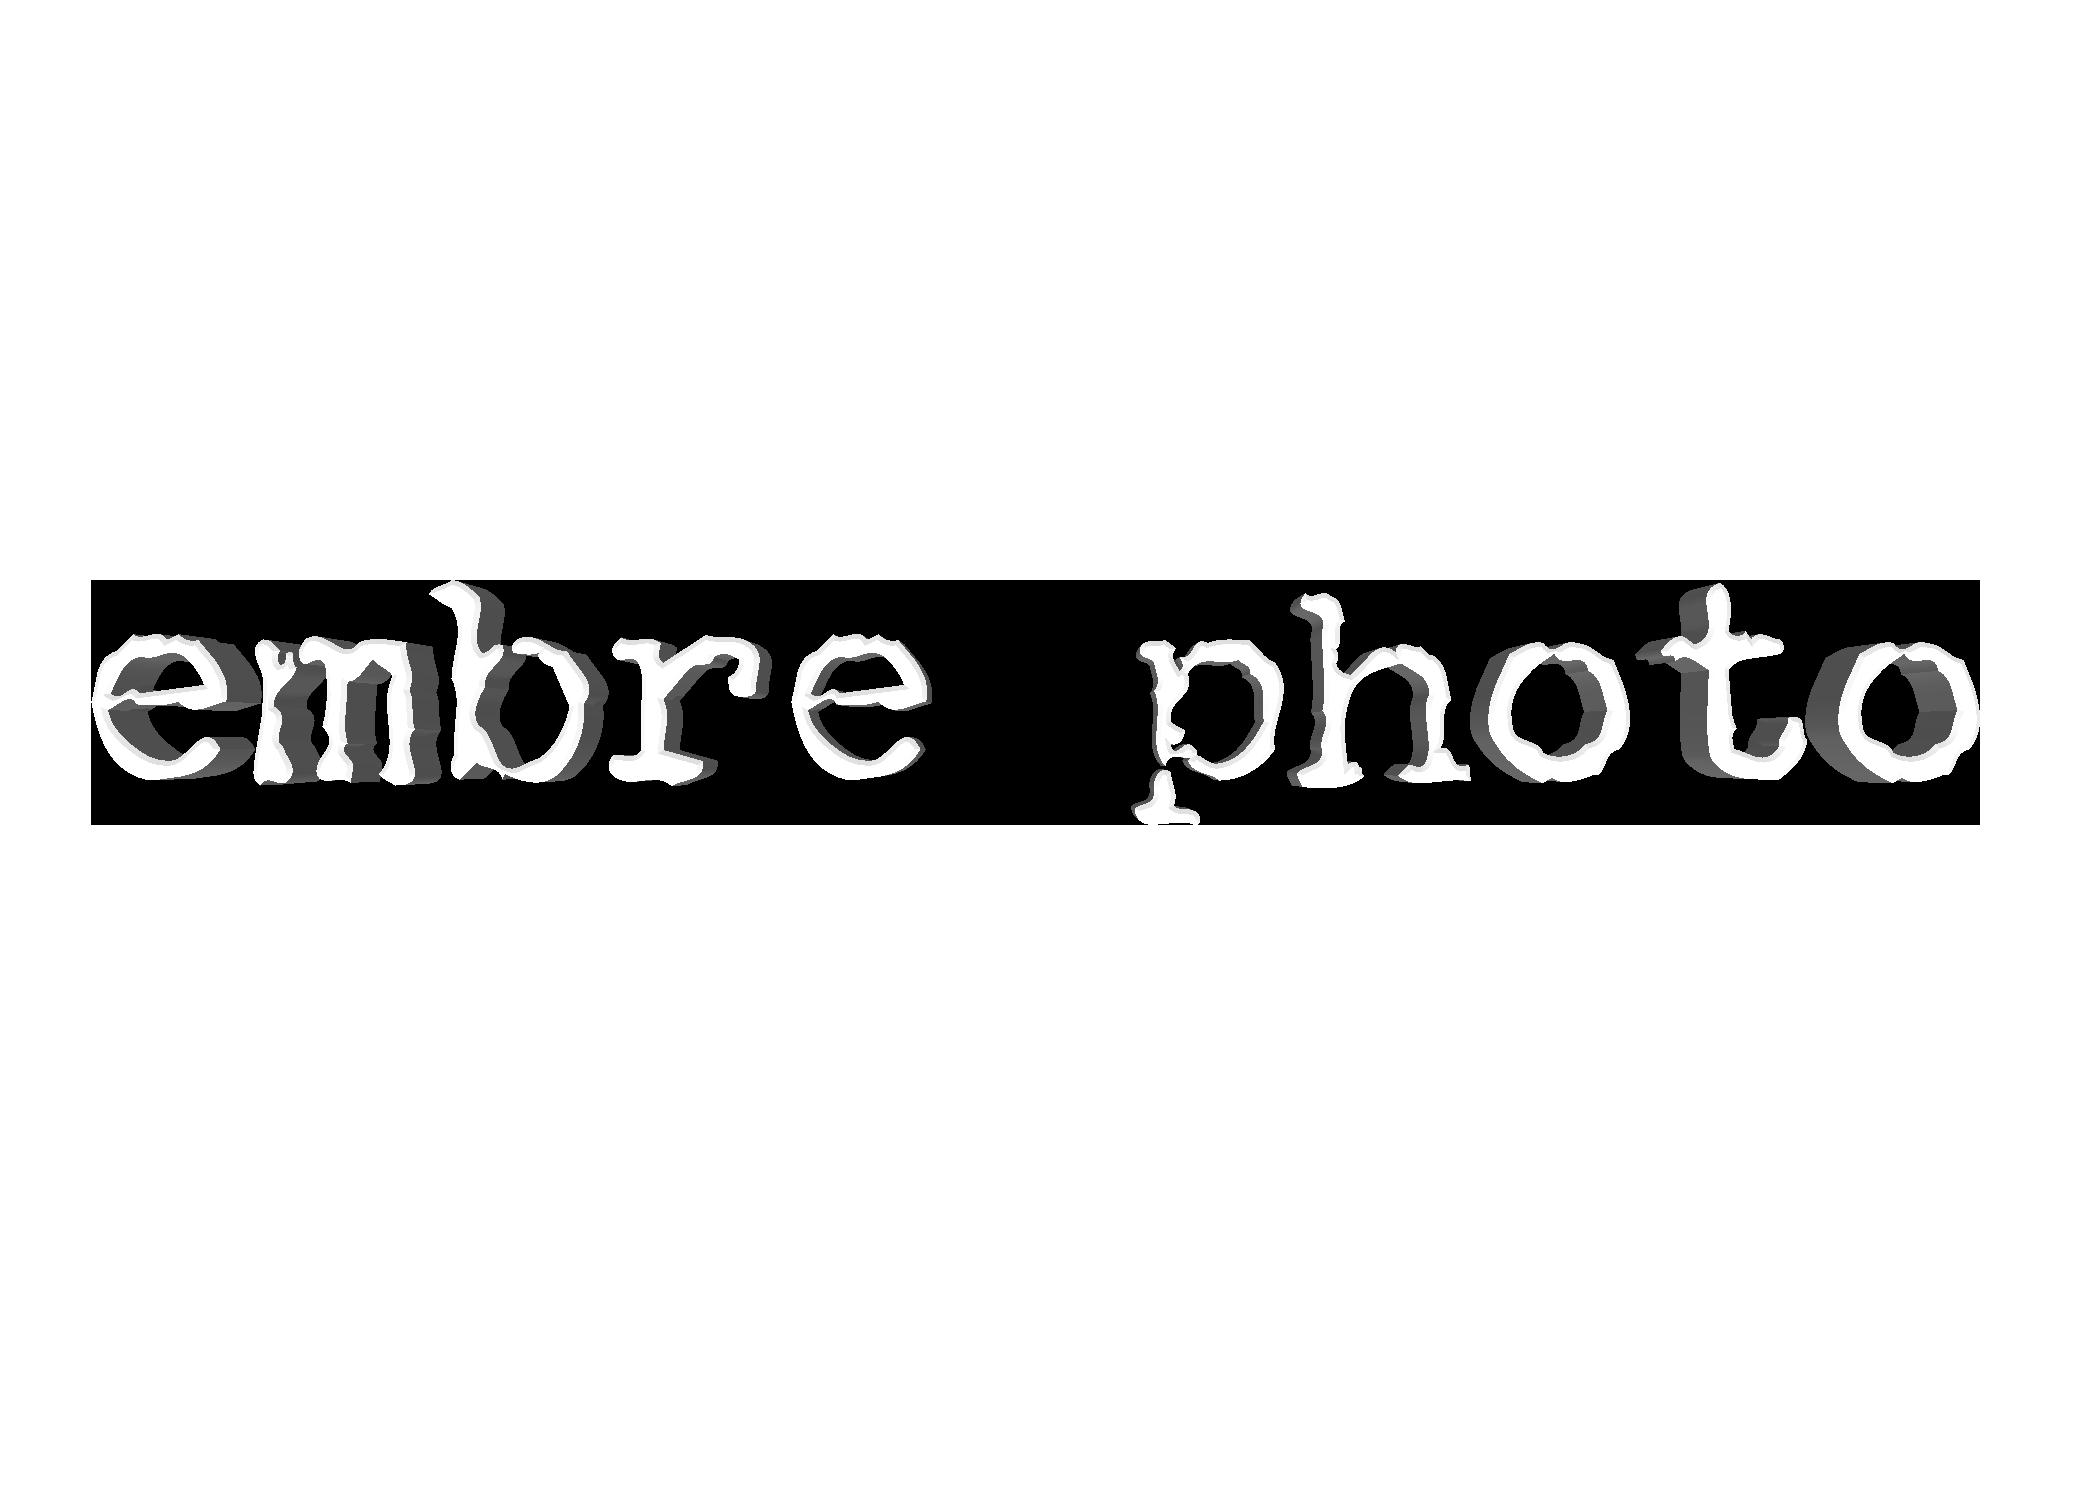 Schedule a Photo-shoot